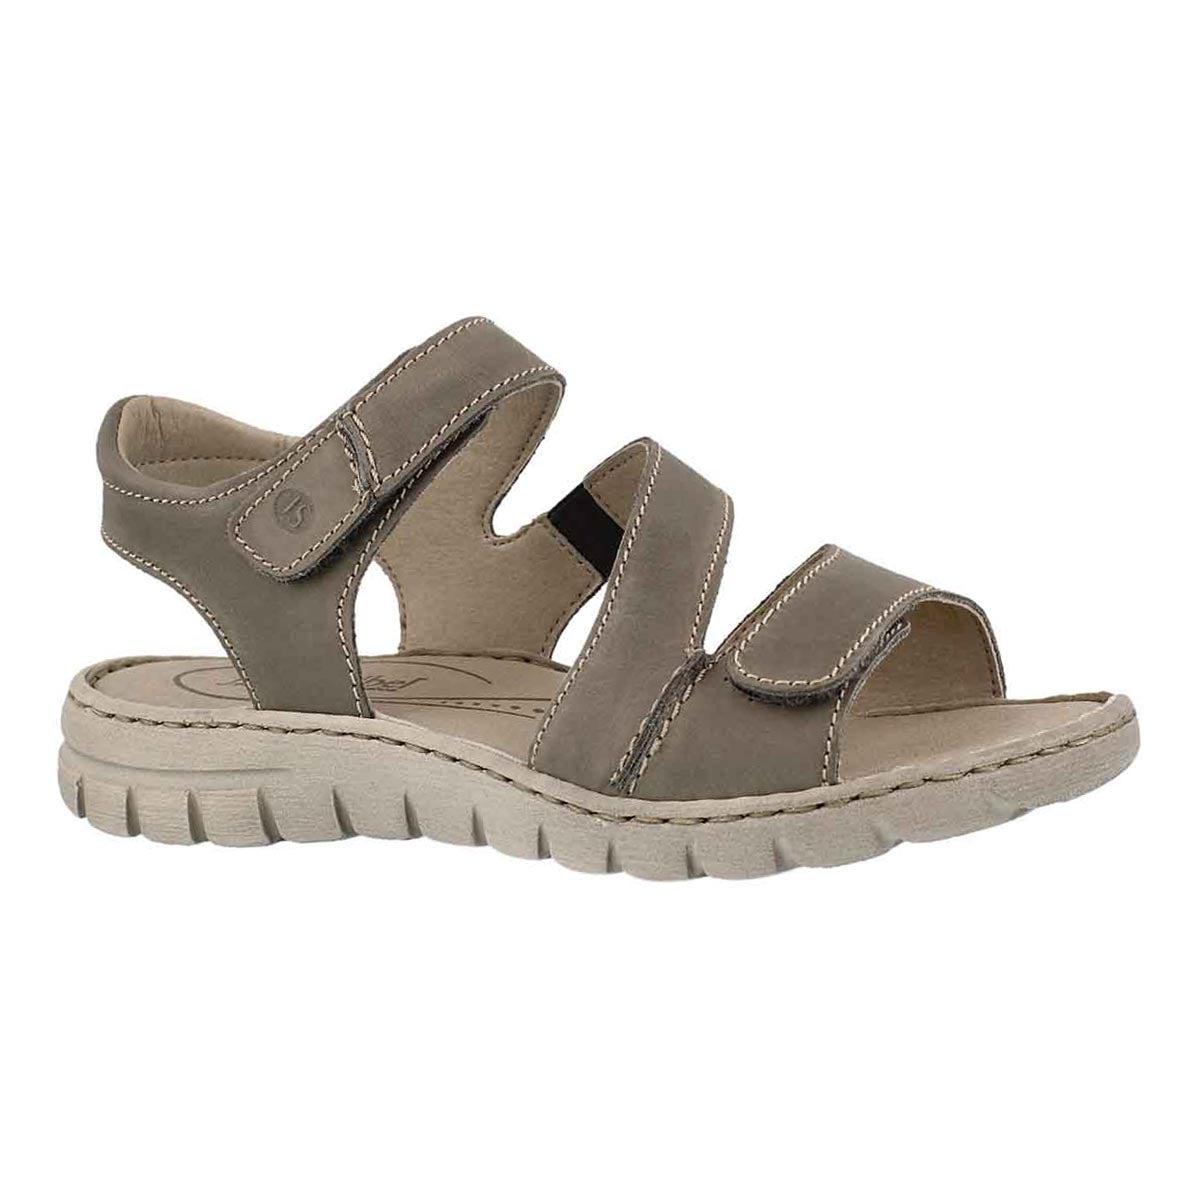 Women's STEFANIE 31 asphalt casual sandal